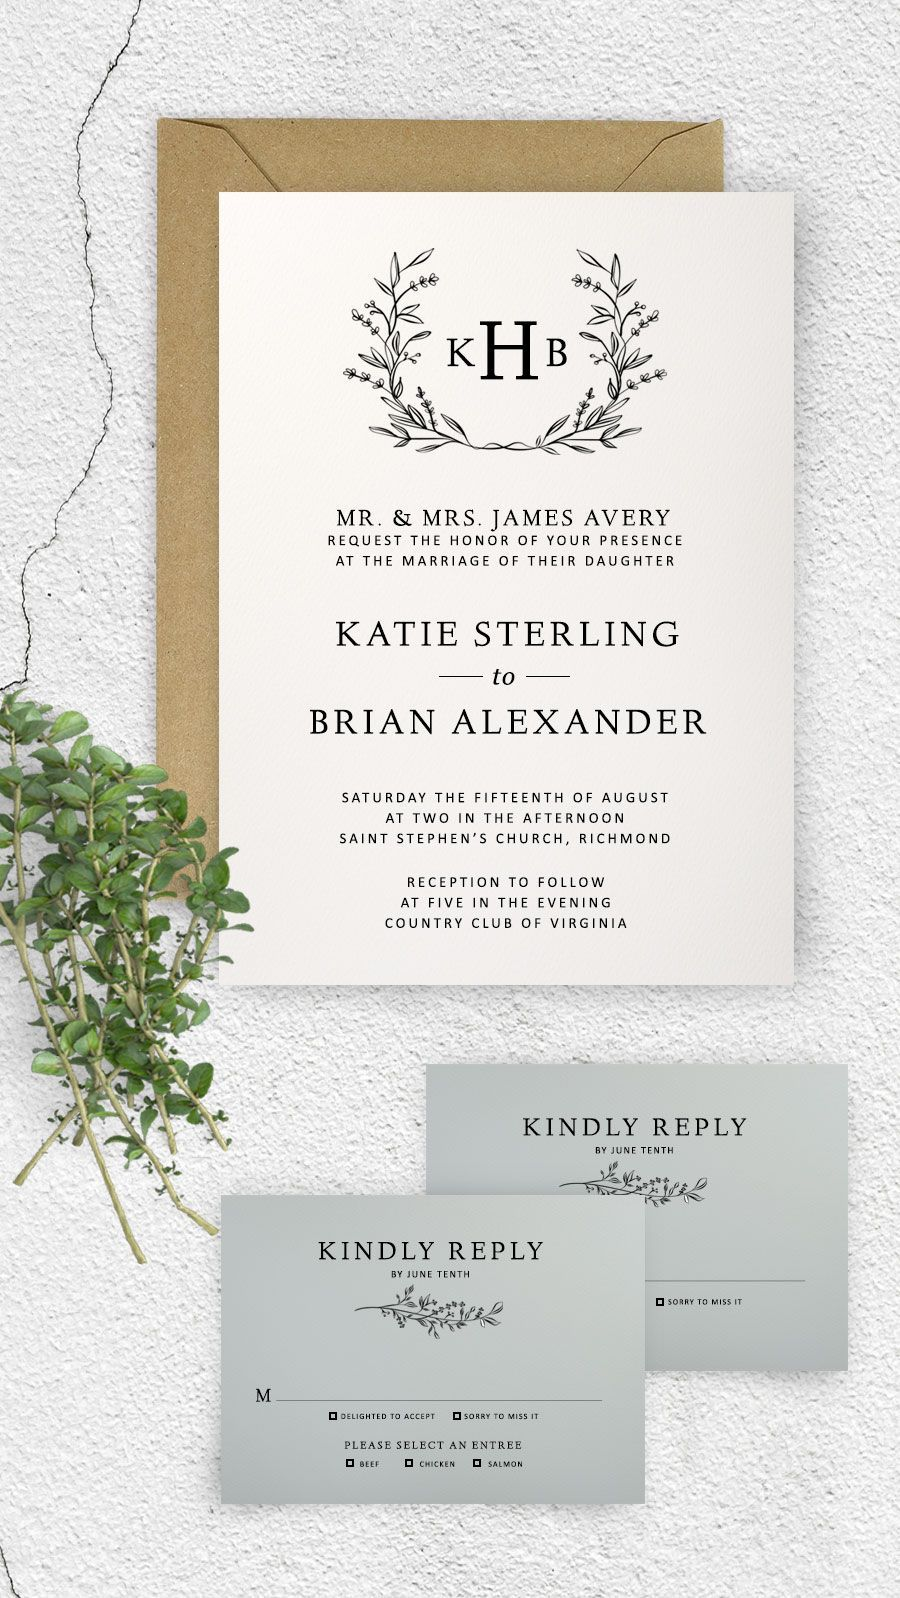 Printable wedding invitations | DIY wedding invitations | Monogram ...